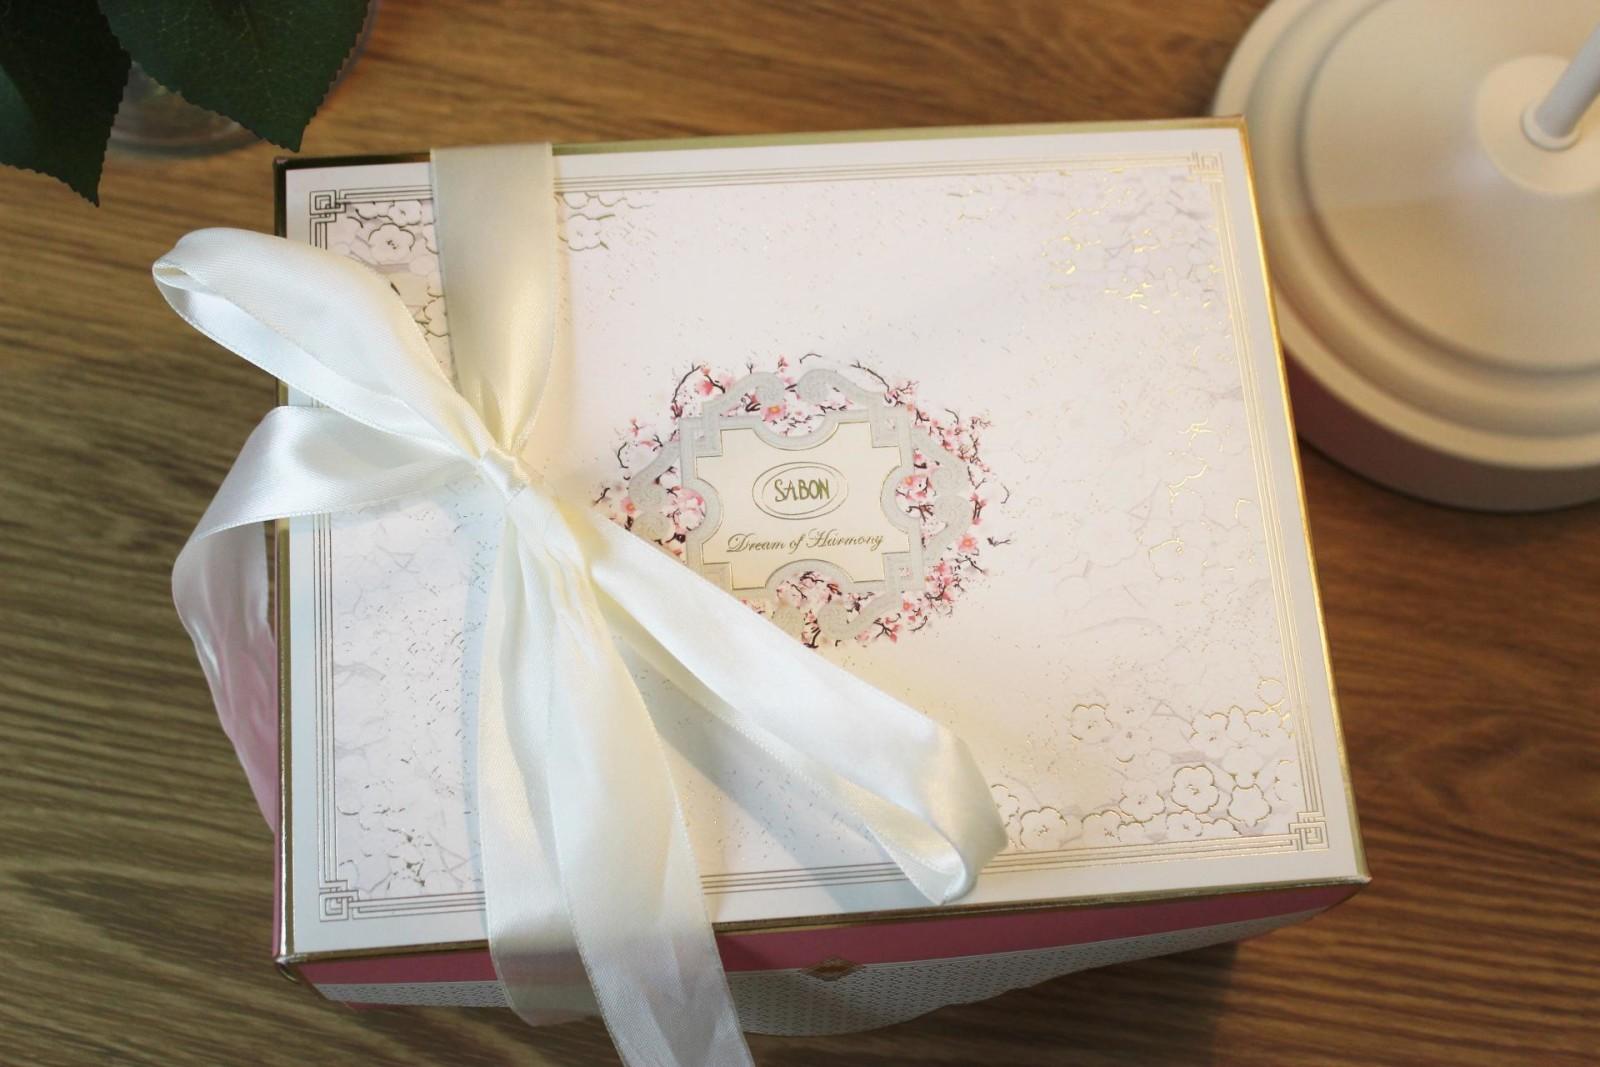 Sabon gift set